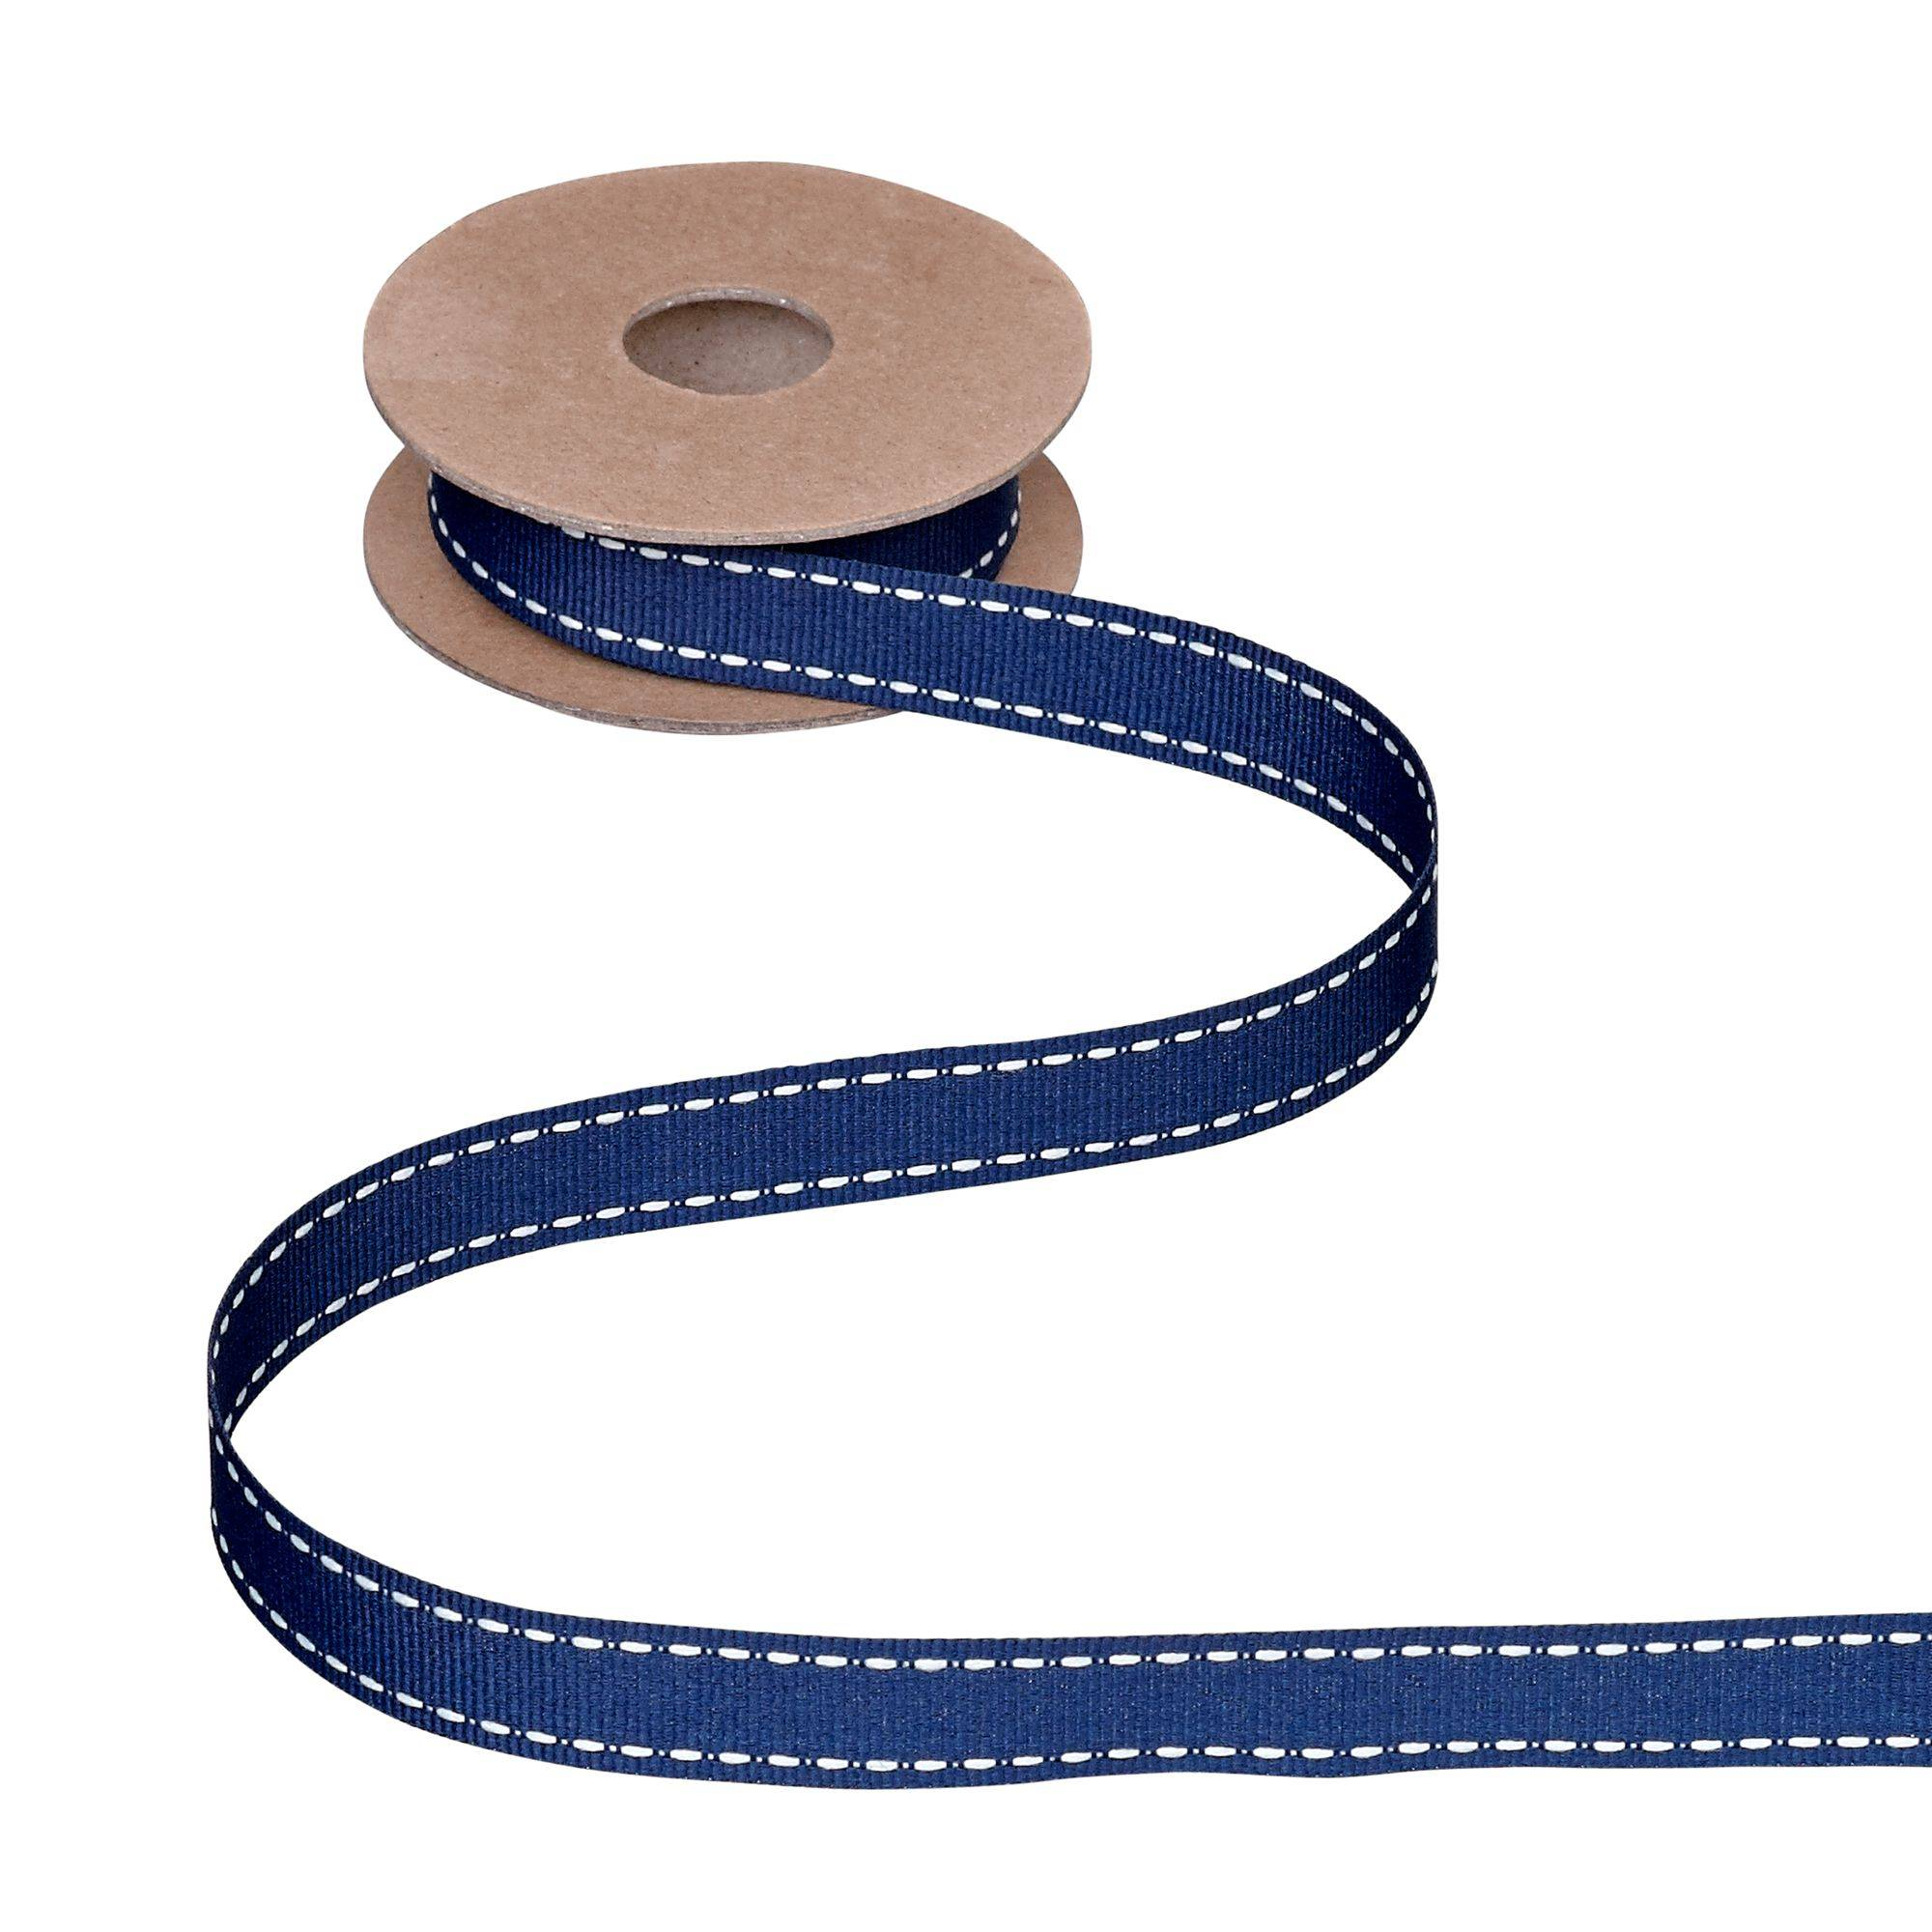 John Lewis & Partners Grosgrain Stitch Ribbon, 5m  - Navy